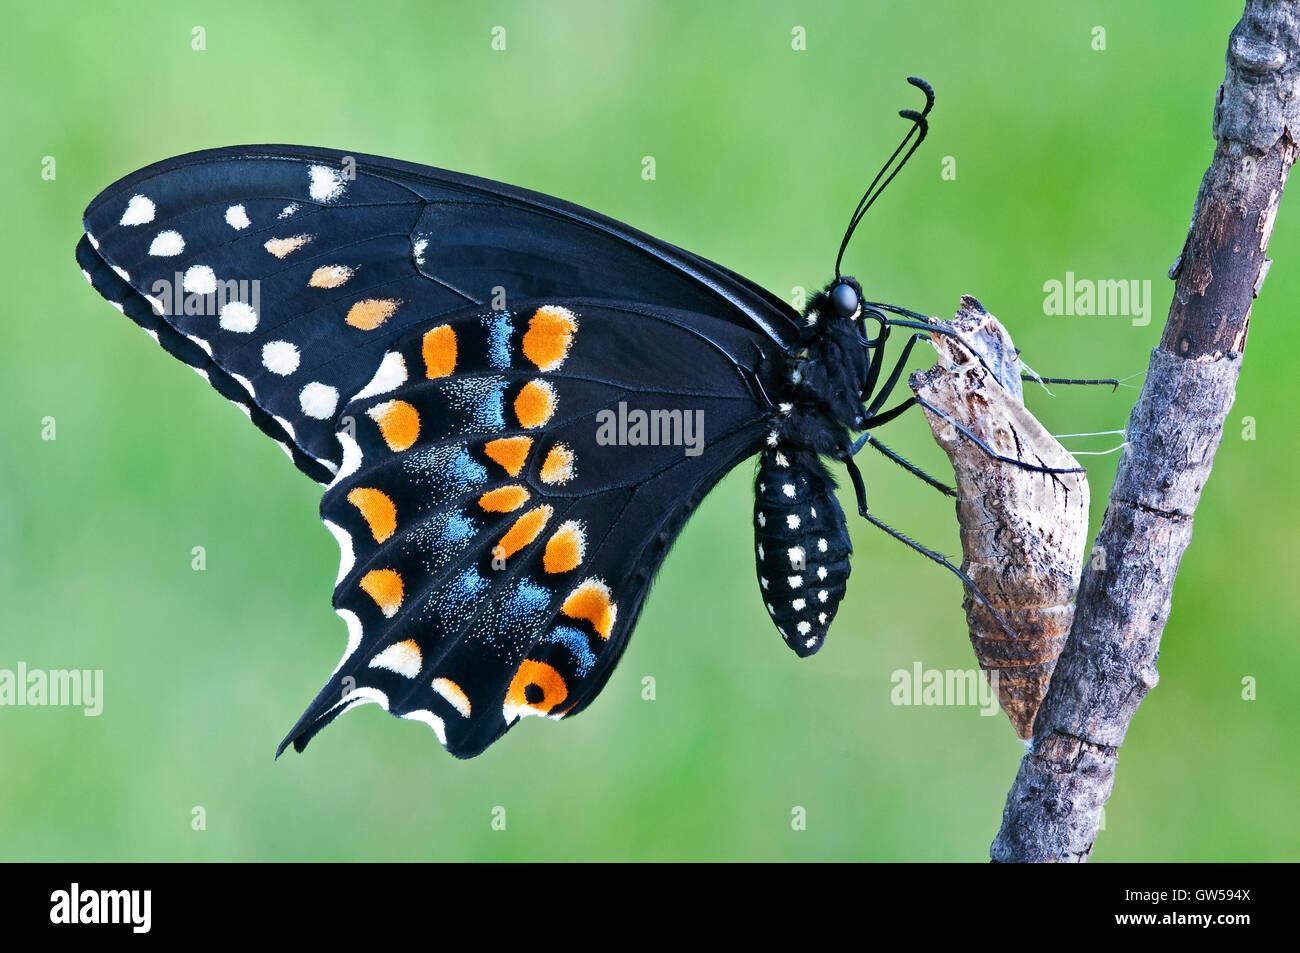 E. Mariposa Negro Papilio polyxenes, hembra, recién emergido de pupa, este de EE.UU., por Skip Moody/Dembinsky Photo Assoc Foto de stock